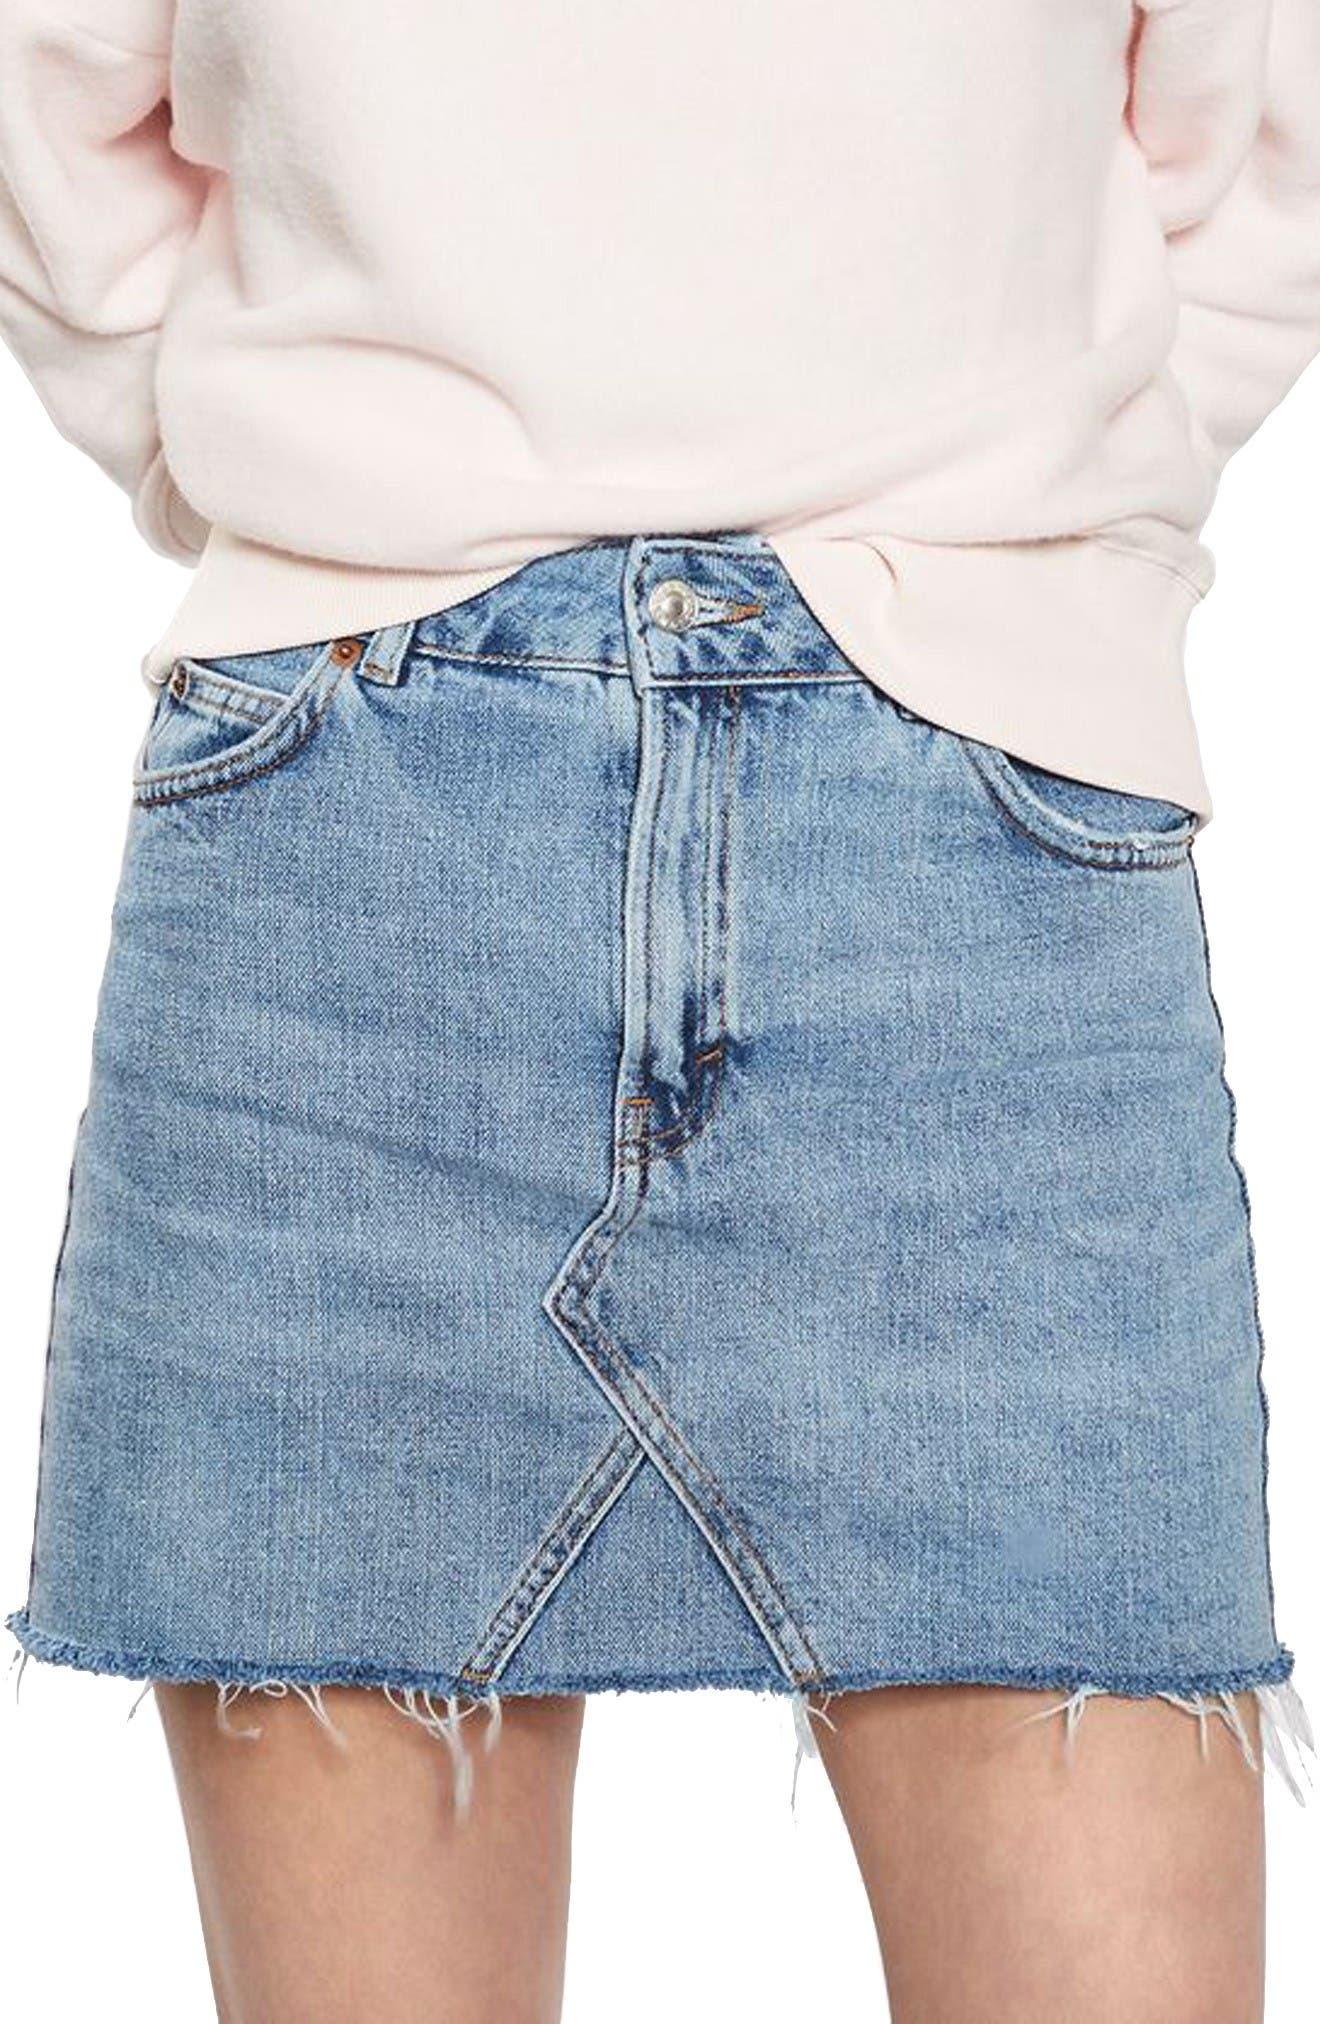 Alternate Image 1 Selected - Topshop Denim Miniskirt